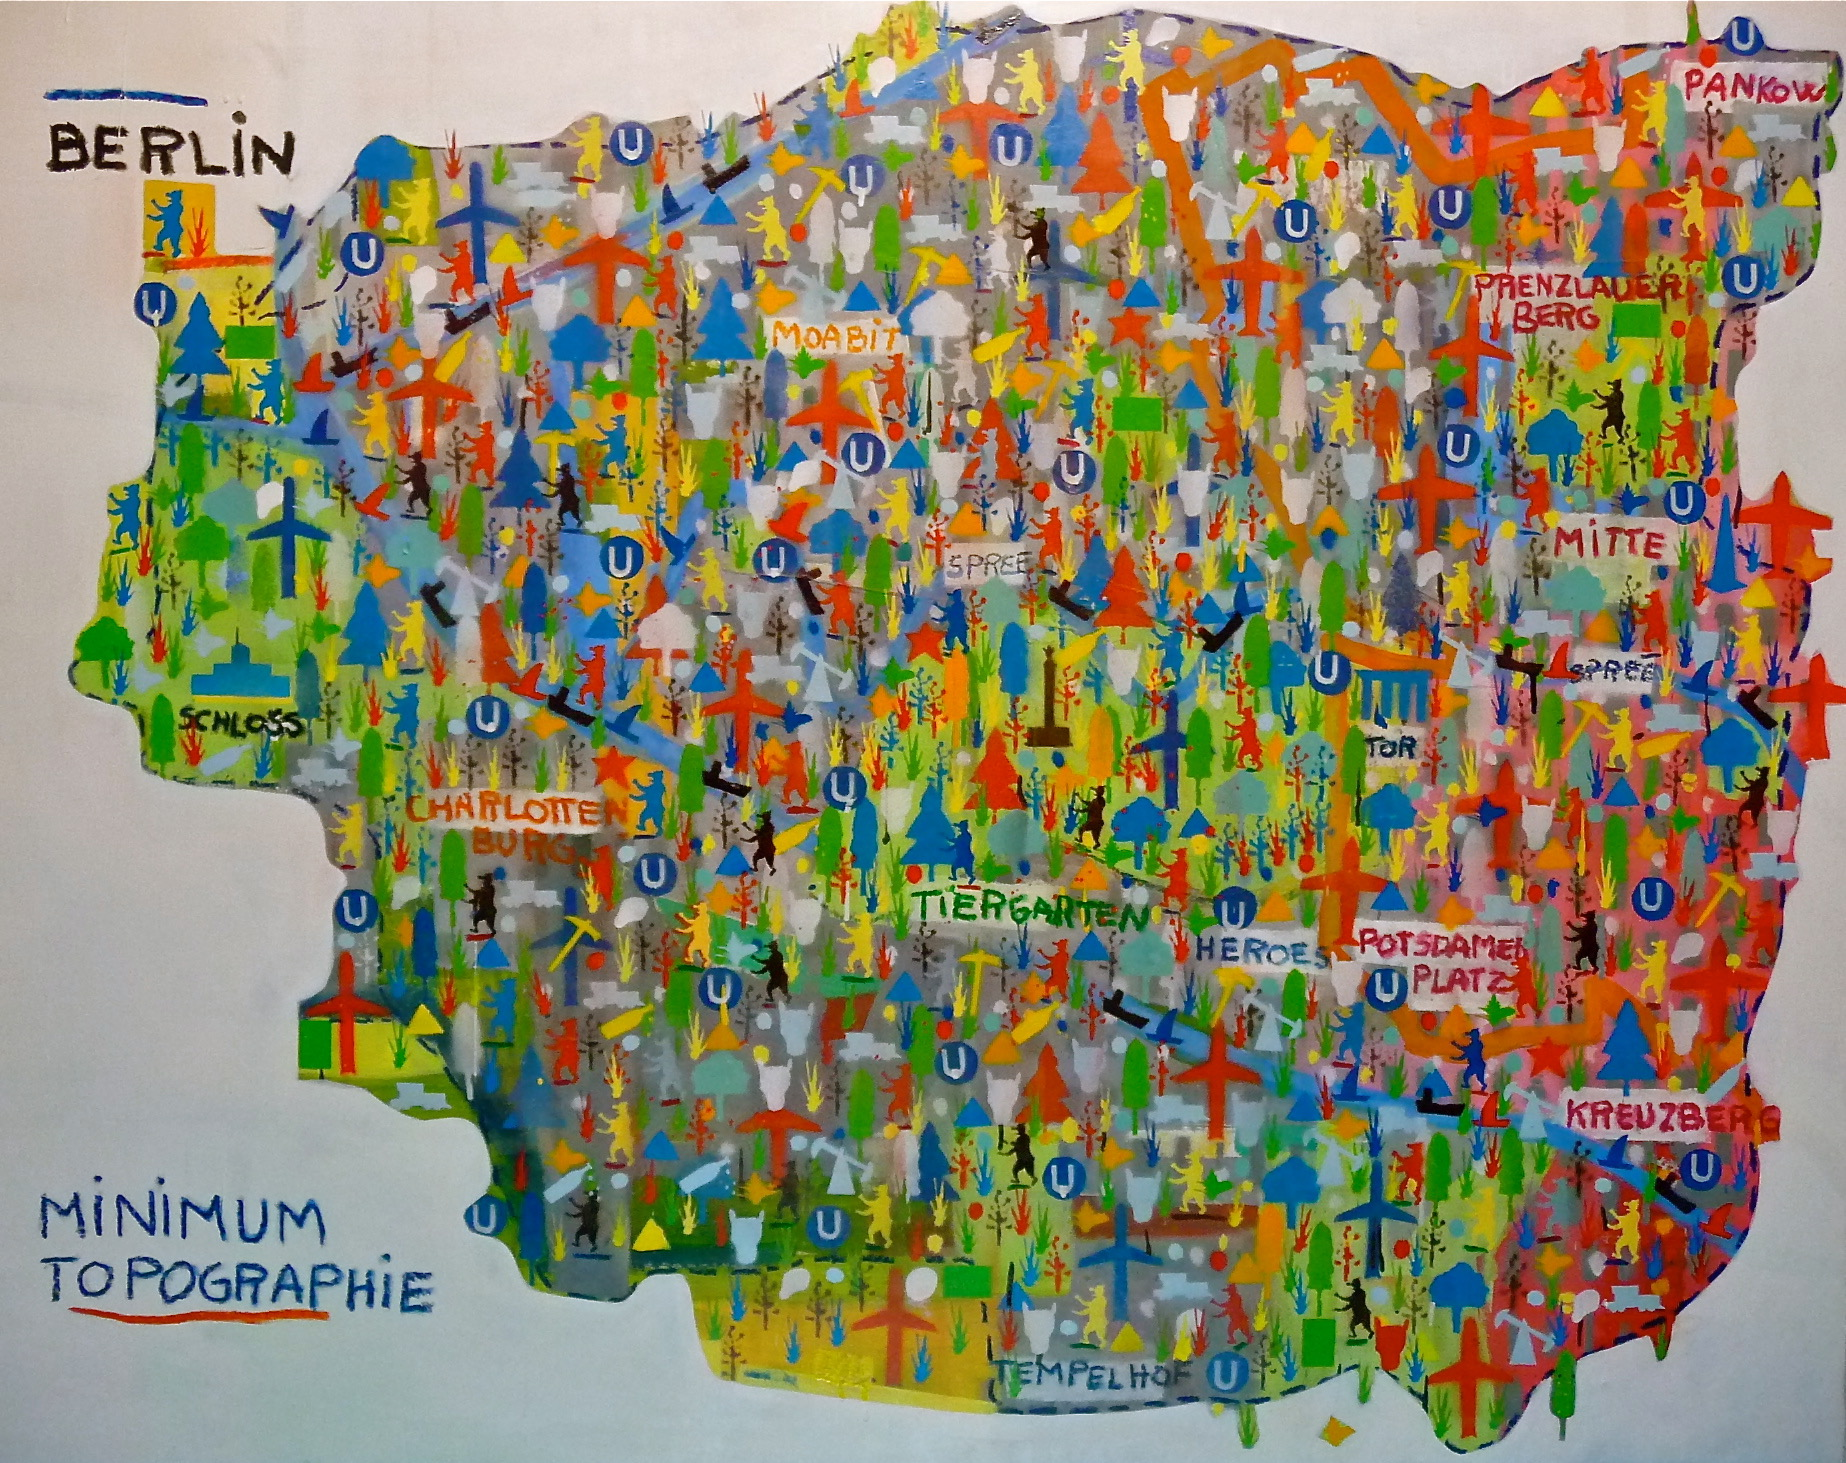 Berlin's Map